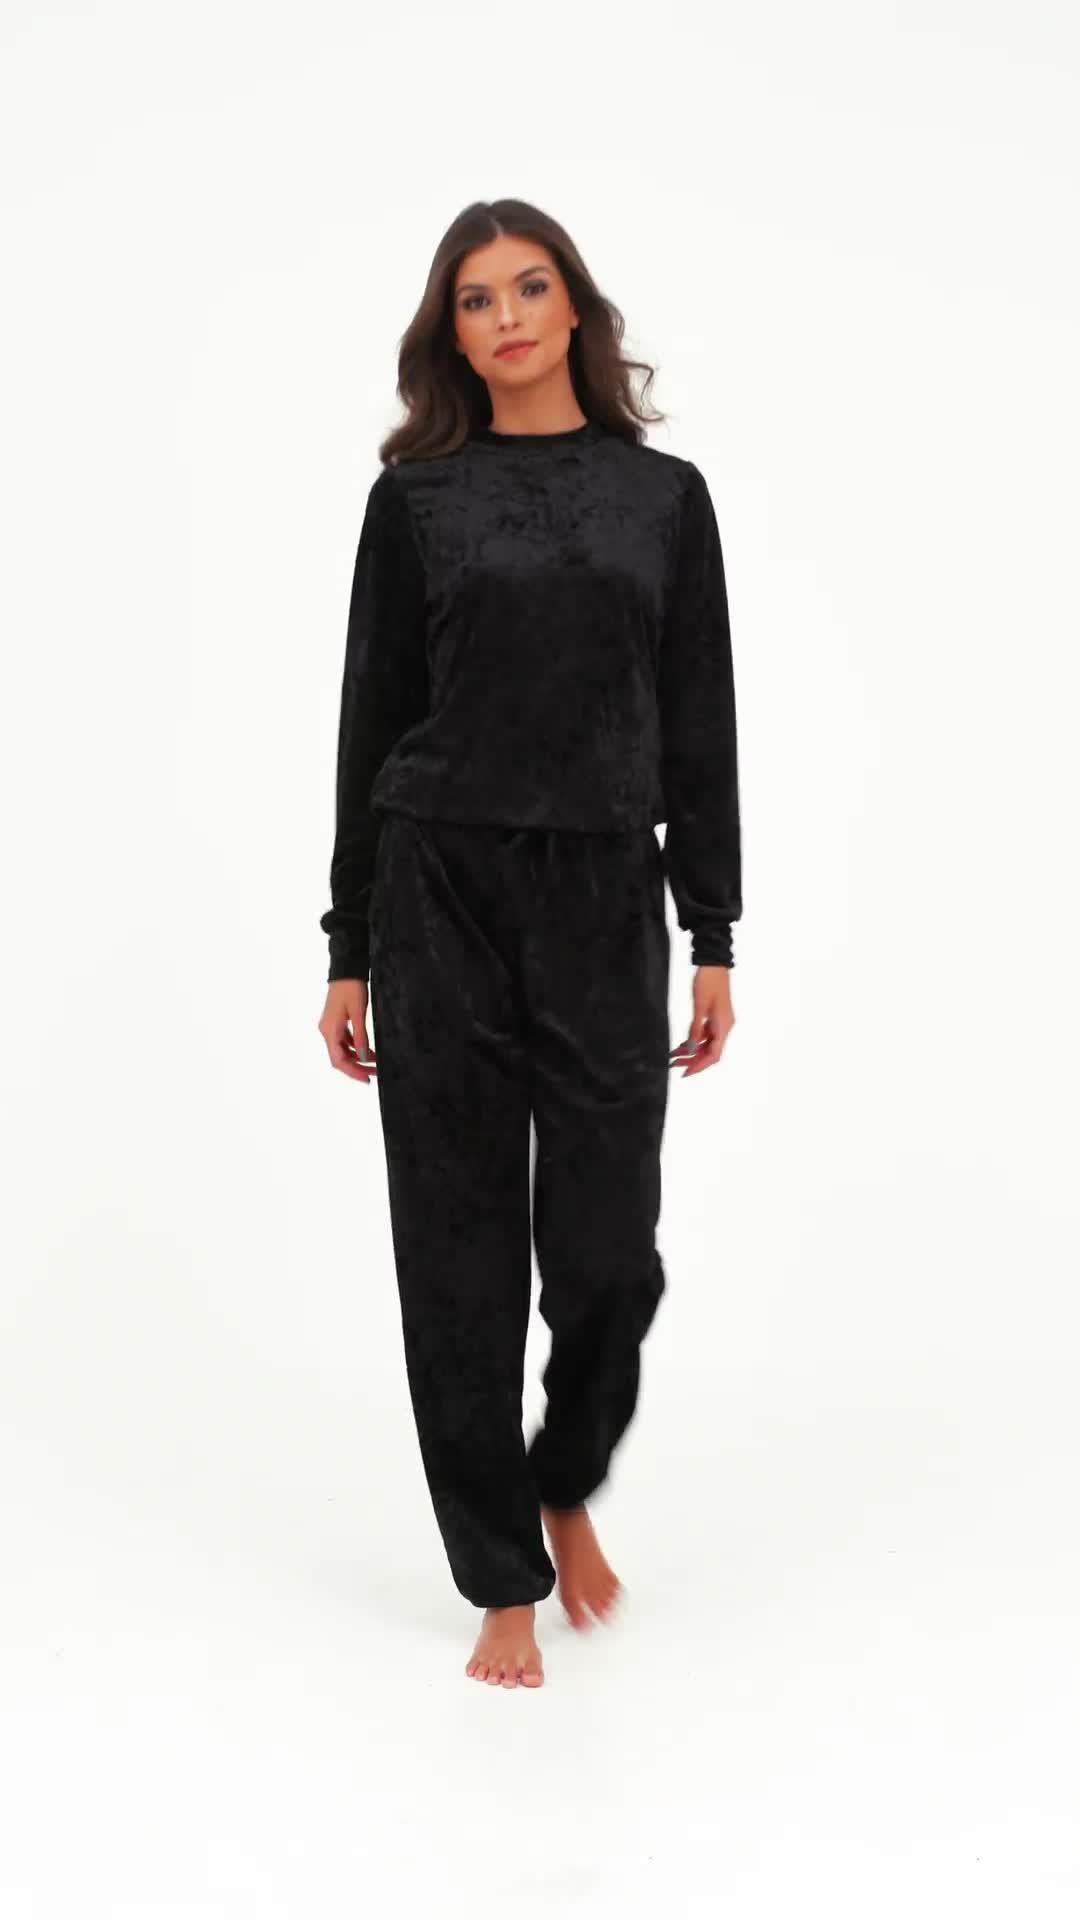 Velvet  velour loose fit cropped tee  T-shirt loungewear